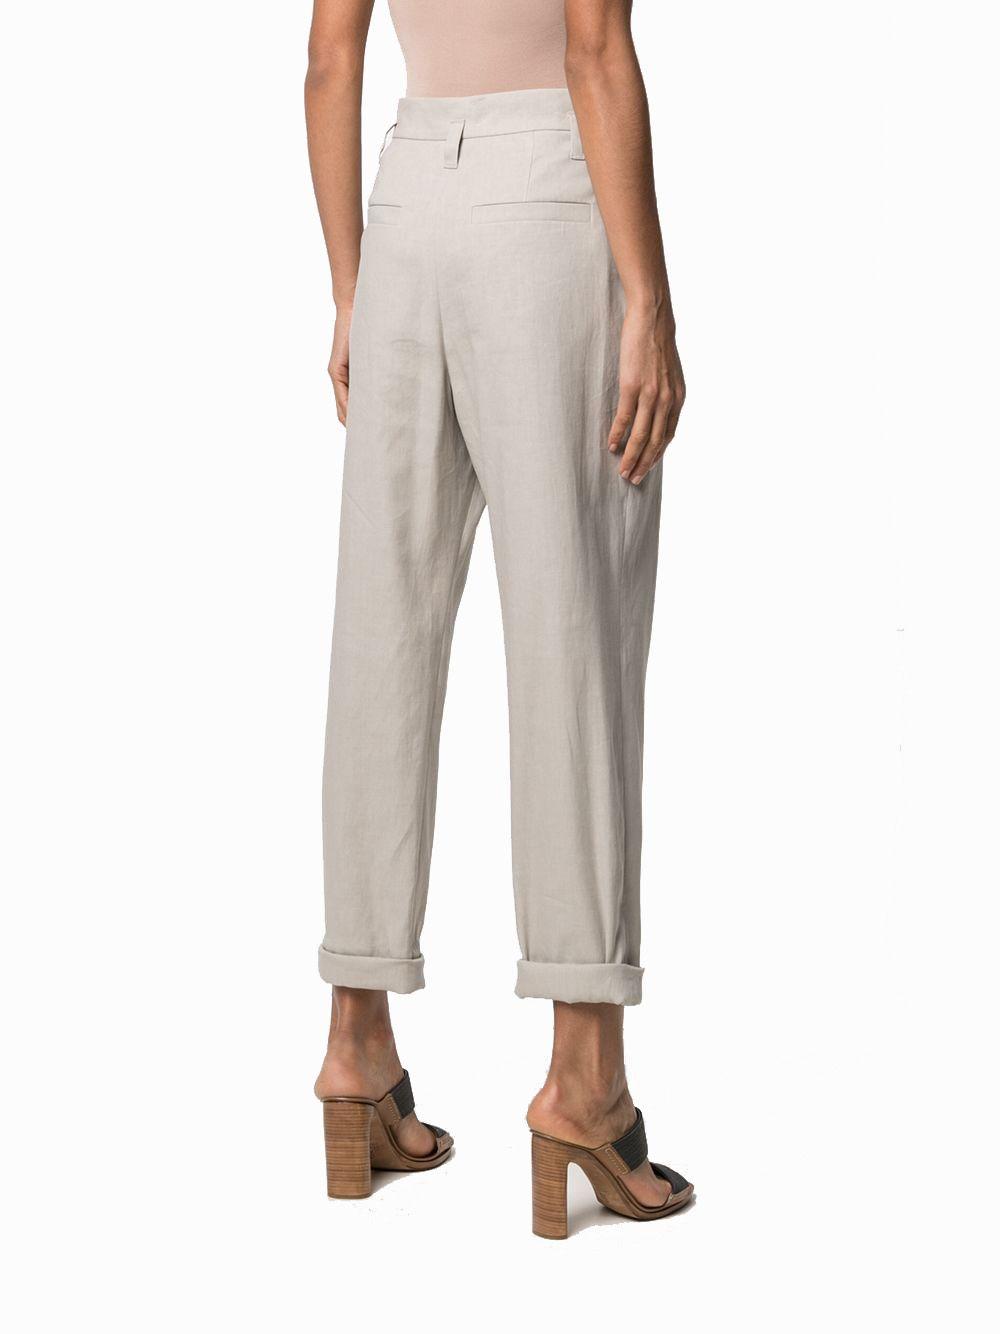 BRUNELLO CUCINELLI Pants BRUNELLO CUCINELLI WOMEN'S GREY LINEN PANTS